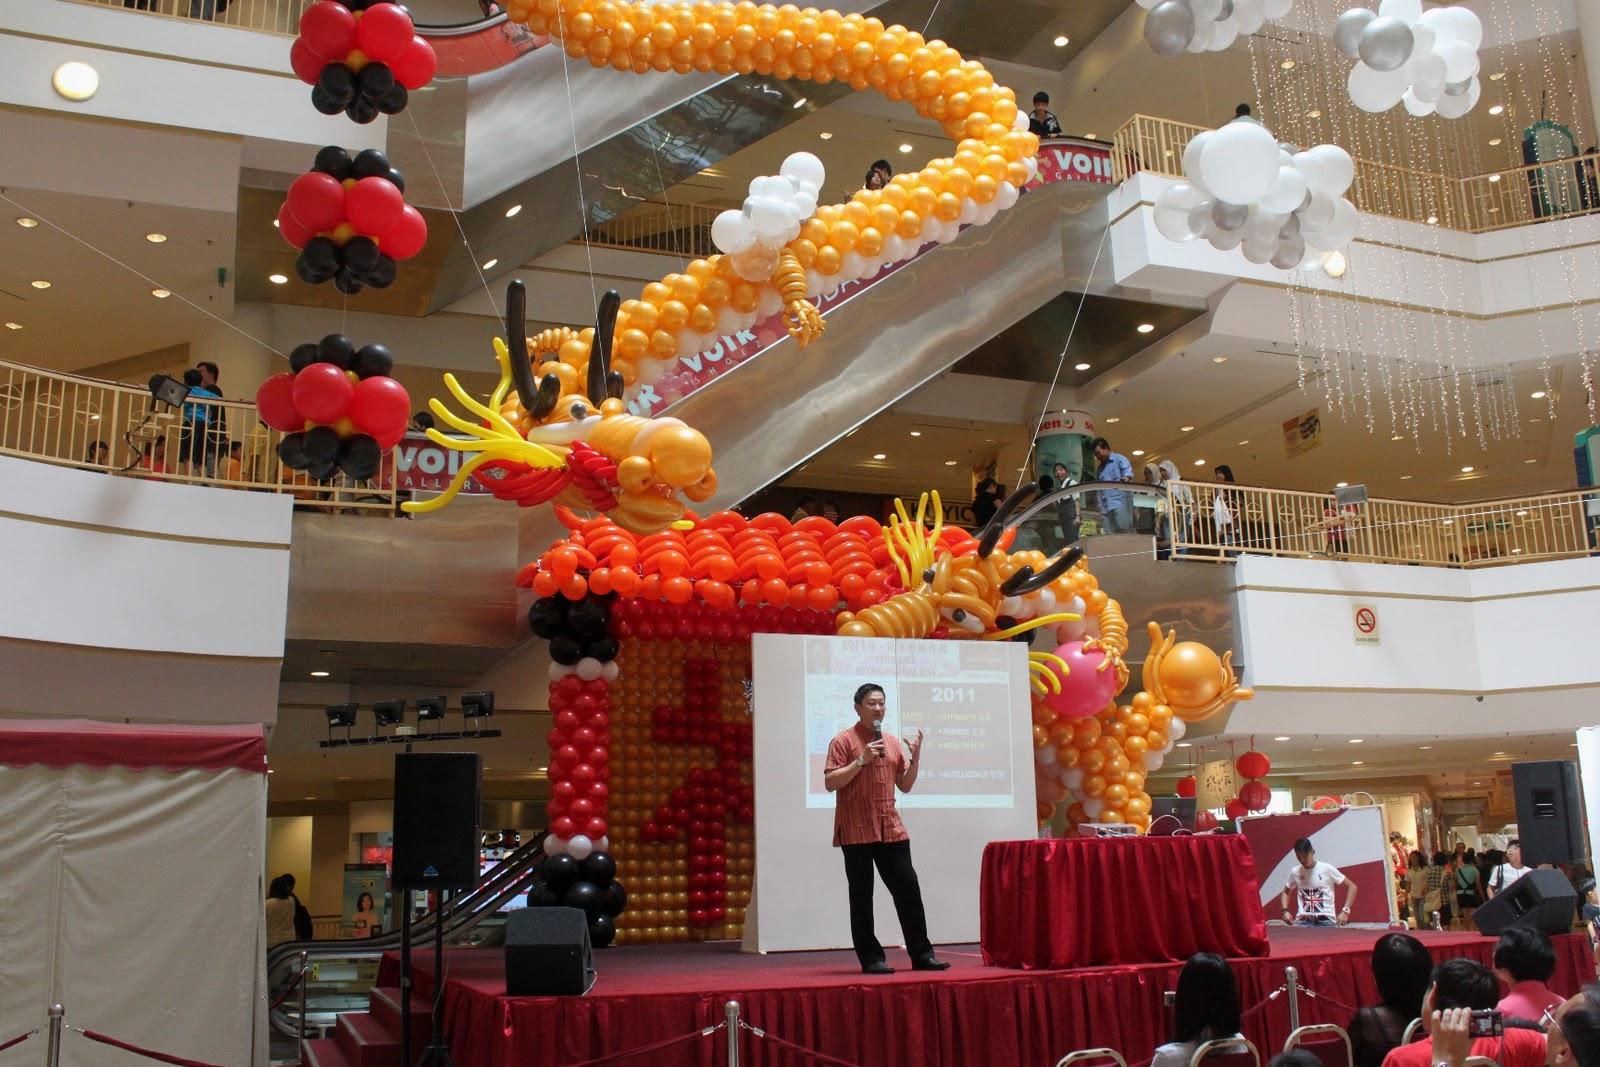 Xing Fu: FENG SHUI TALK FOR PATRONS OF IPOH PARADE